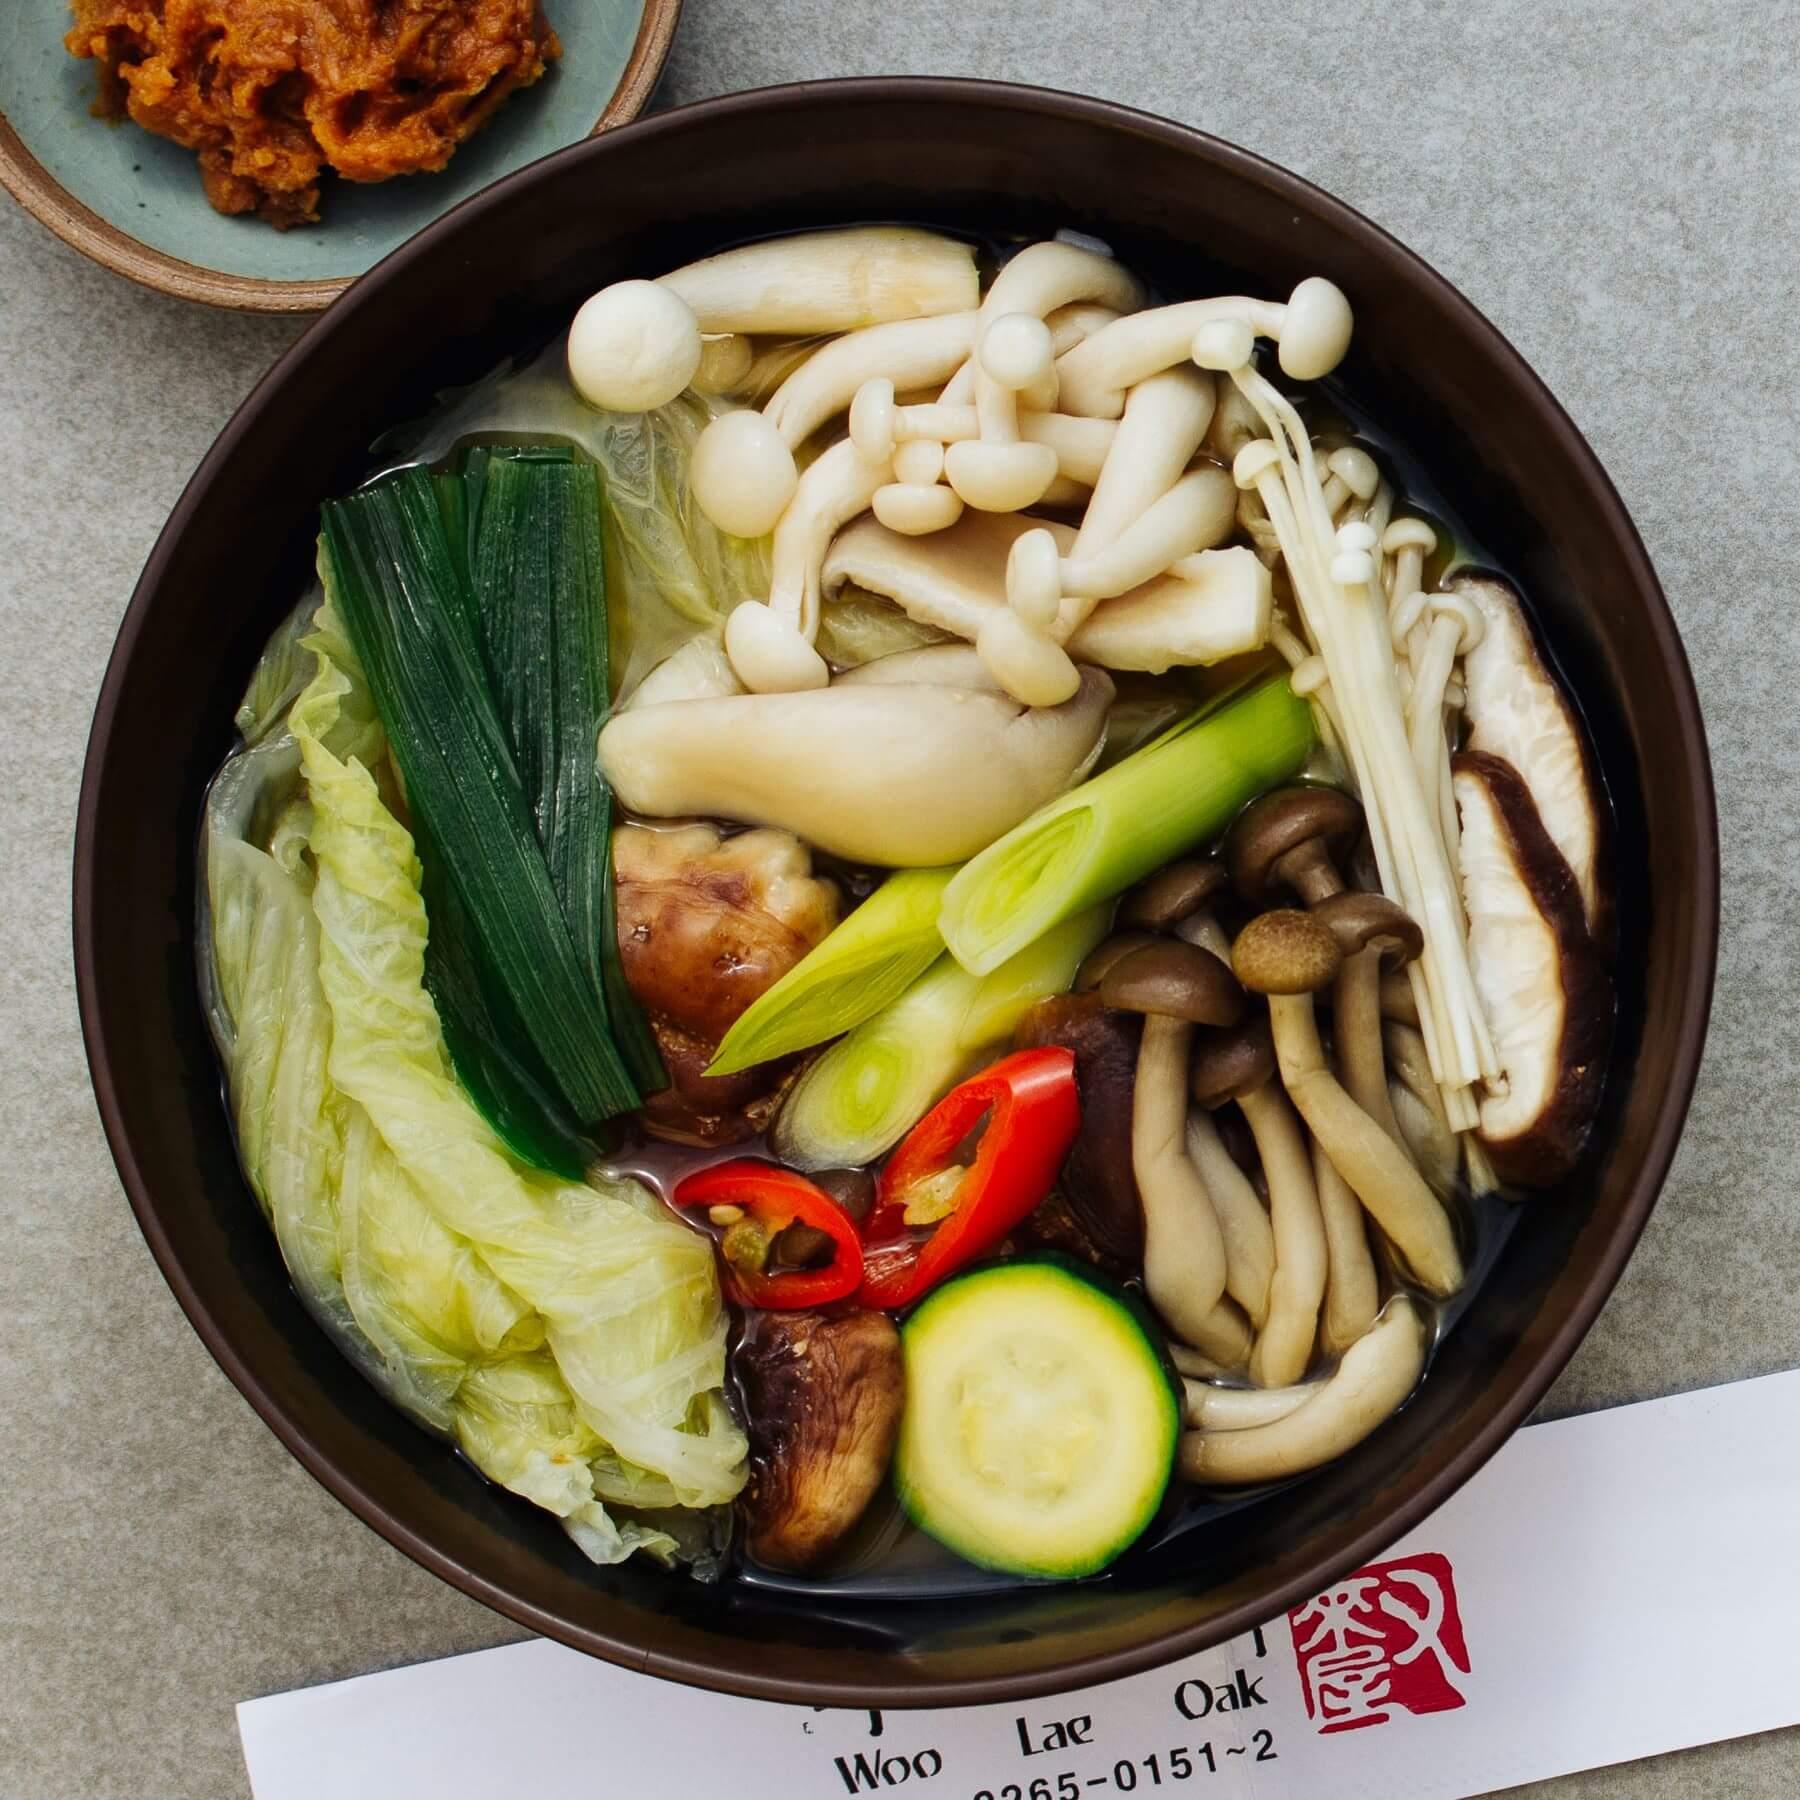 Koreanischer Hot Pot mit Pilzen und Tofu - Doenjang Beoseot Jeongol